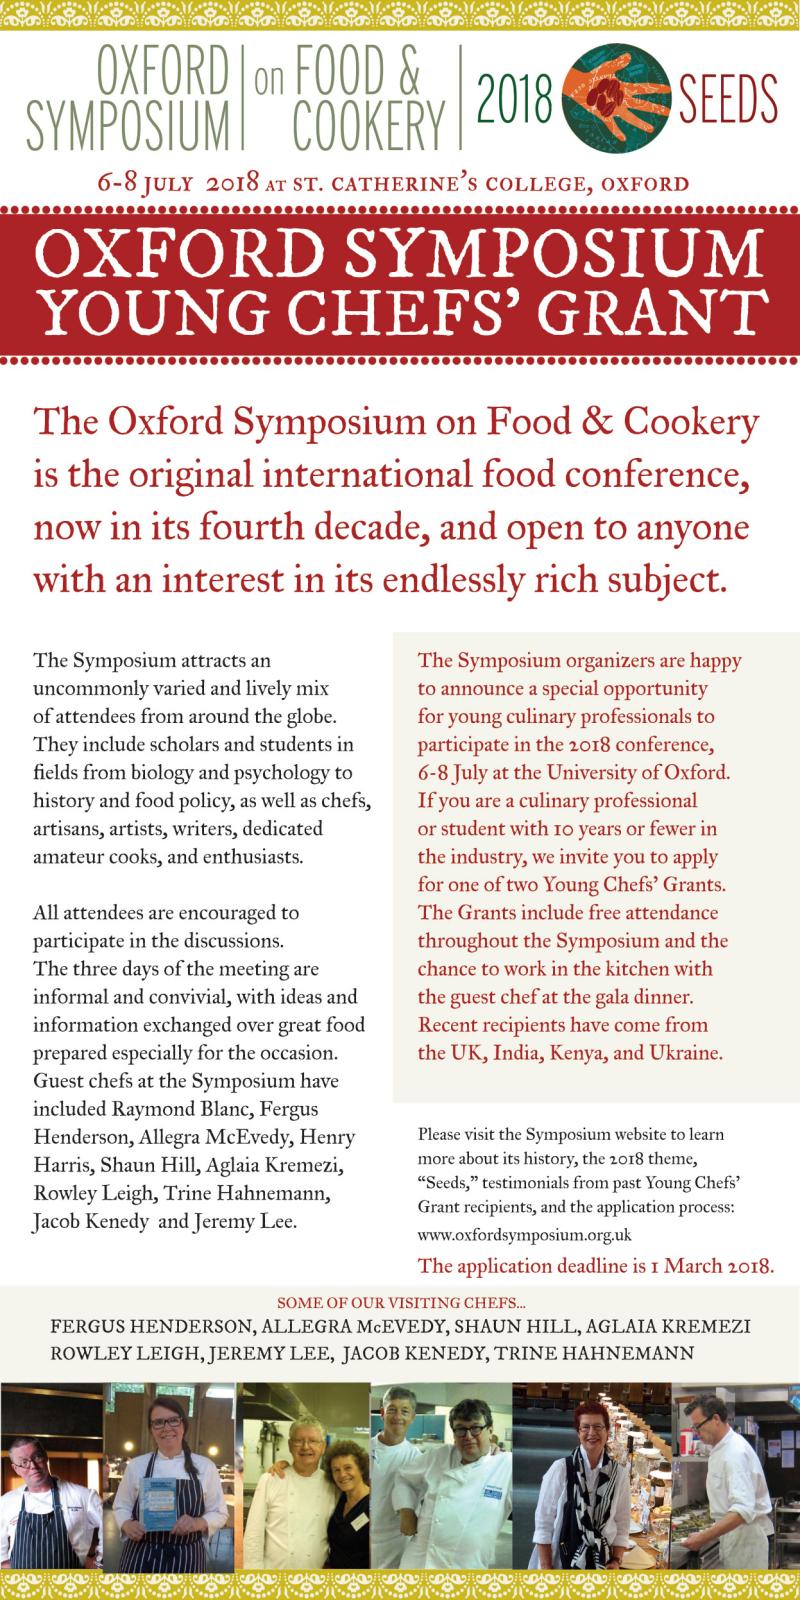 Oxford Symposium Grants 2018